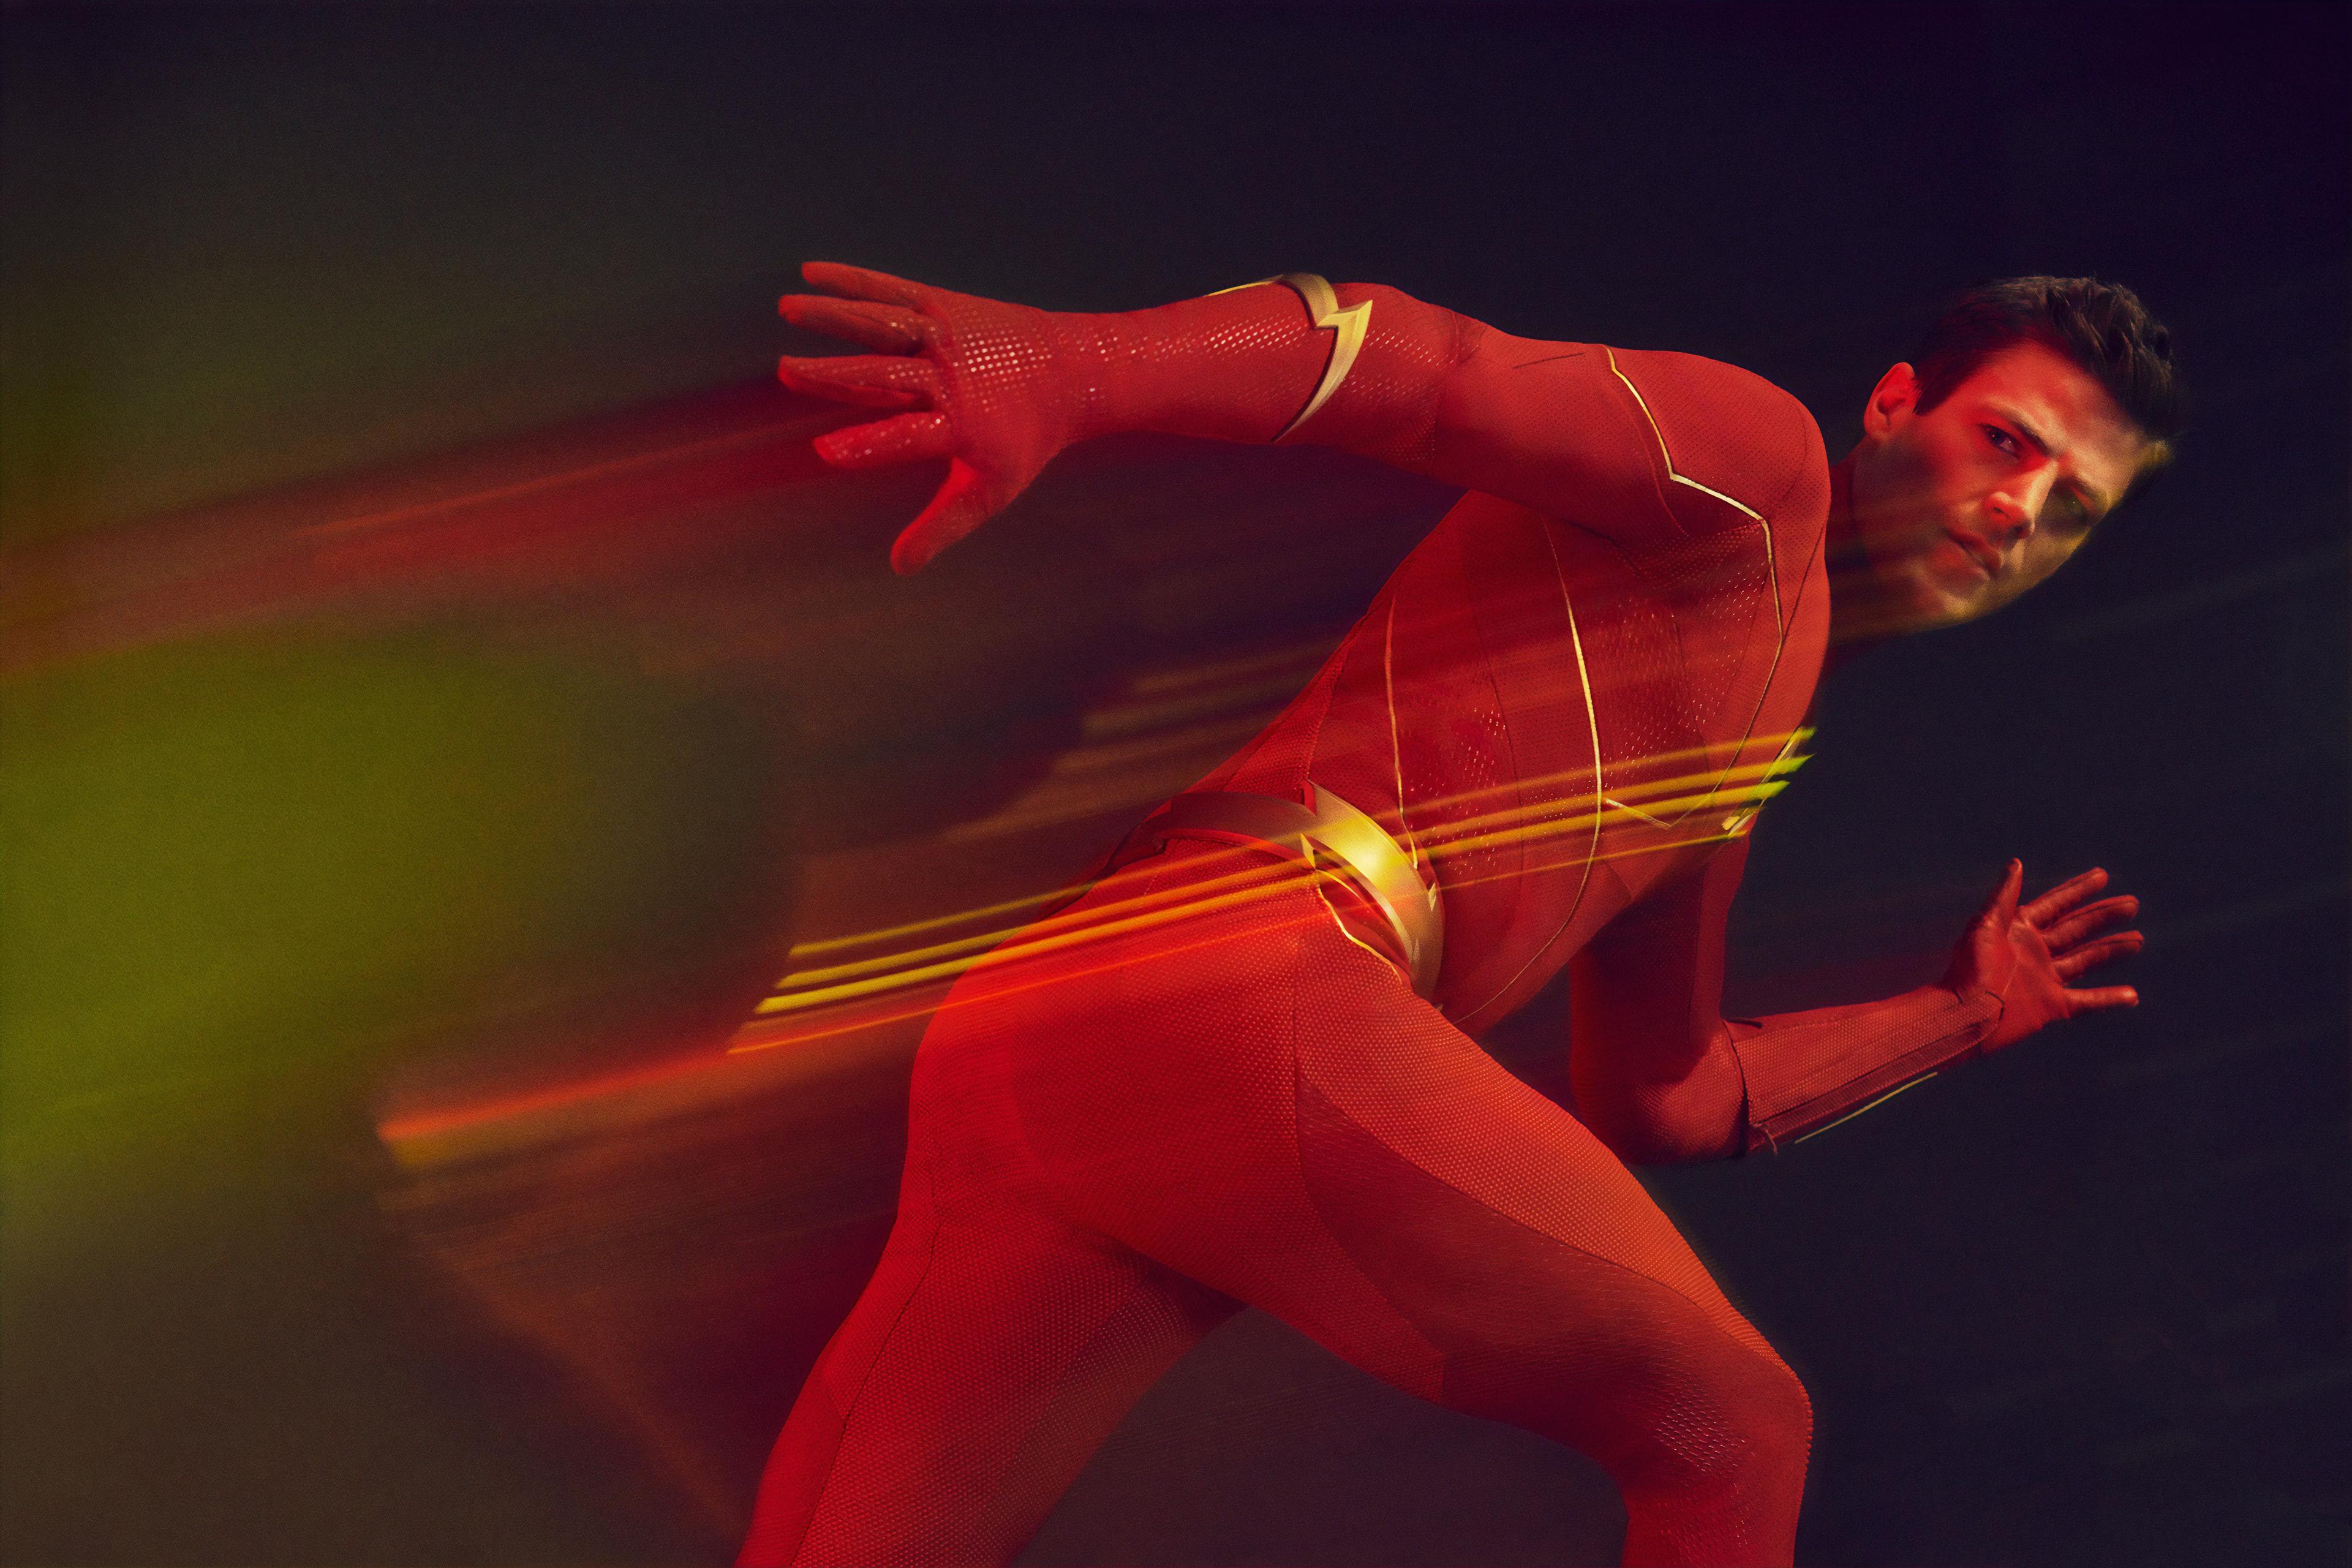 the flash season 6 1577915265 - The Flash Season 6 -